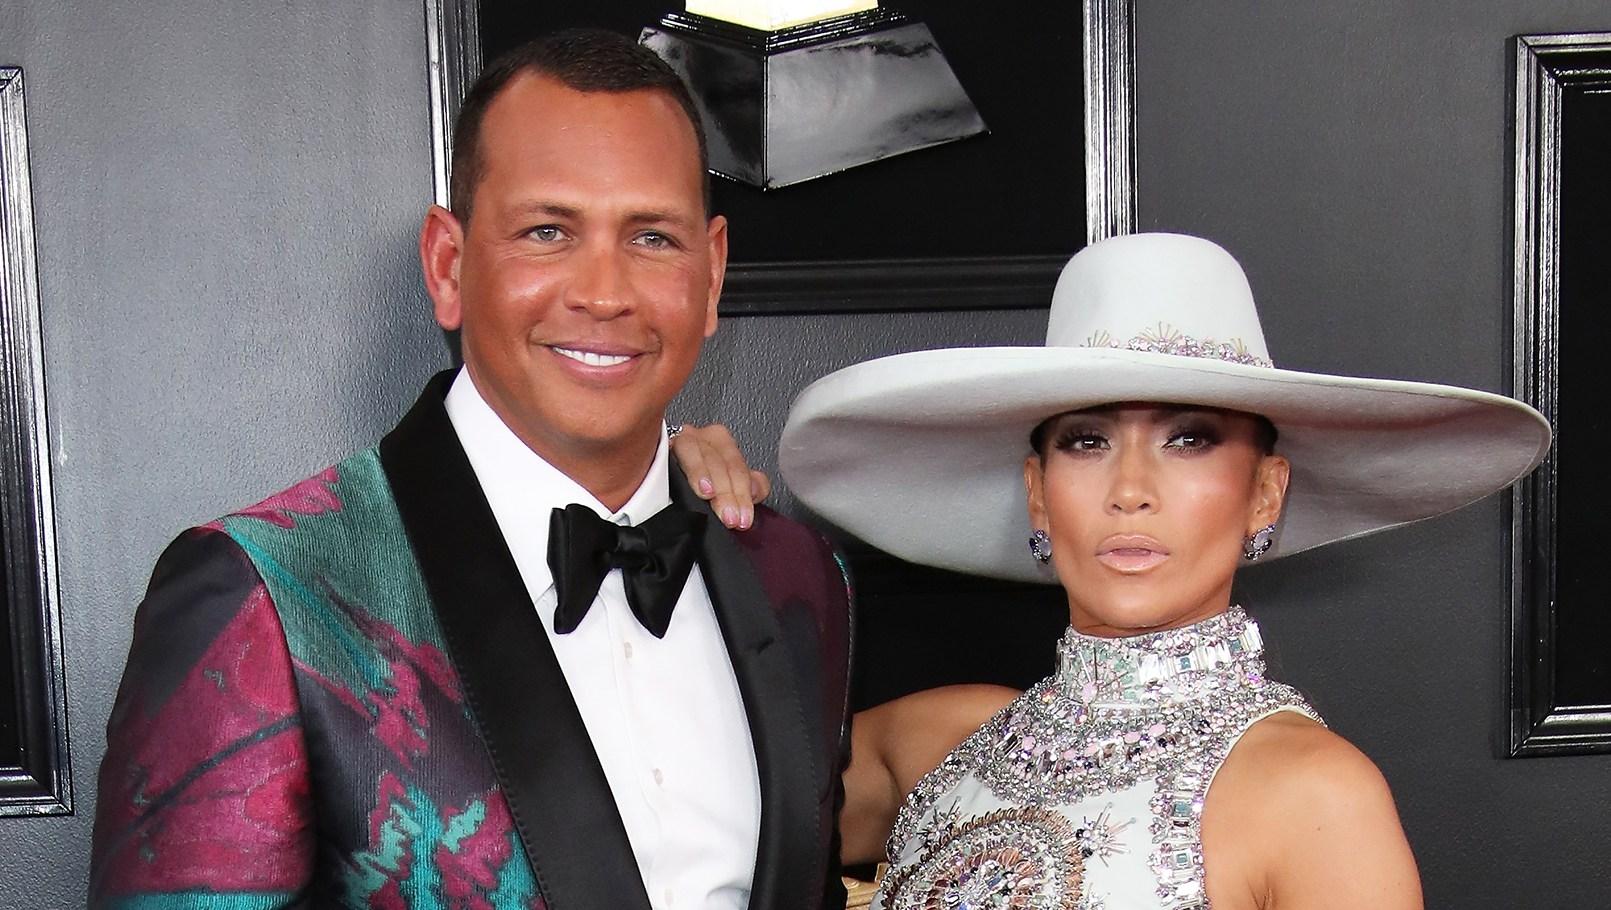 Jennifer Lopez Shows Off Pole-Dancing Skills While BF Alex Rodriguez